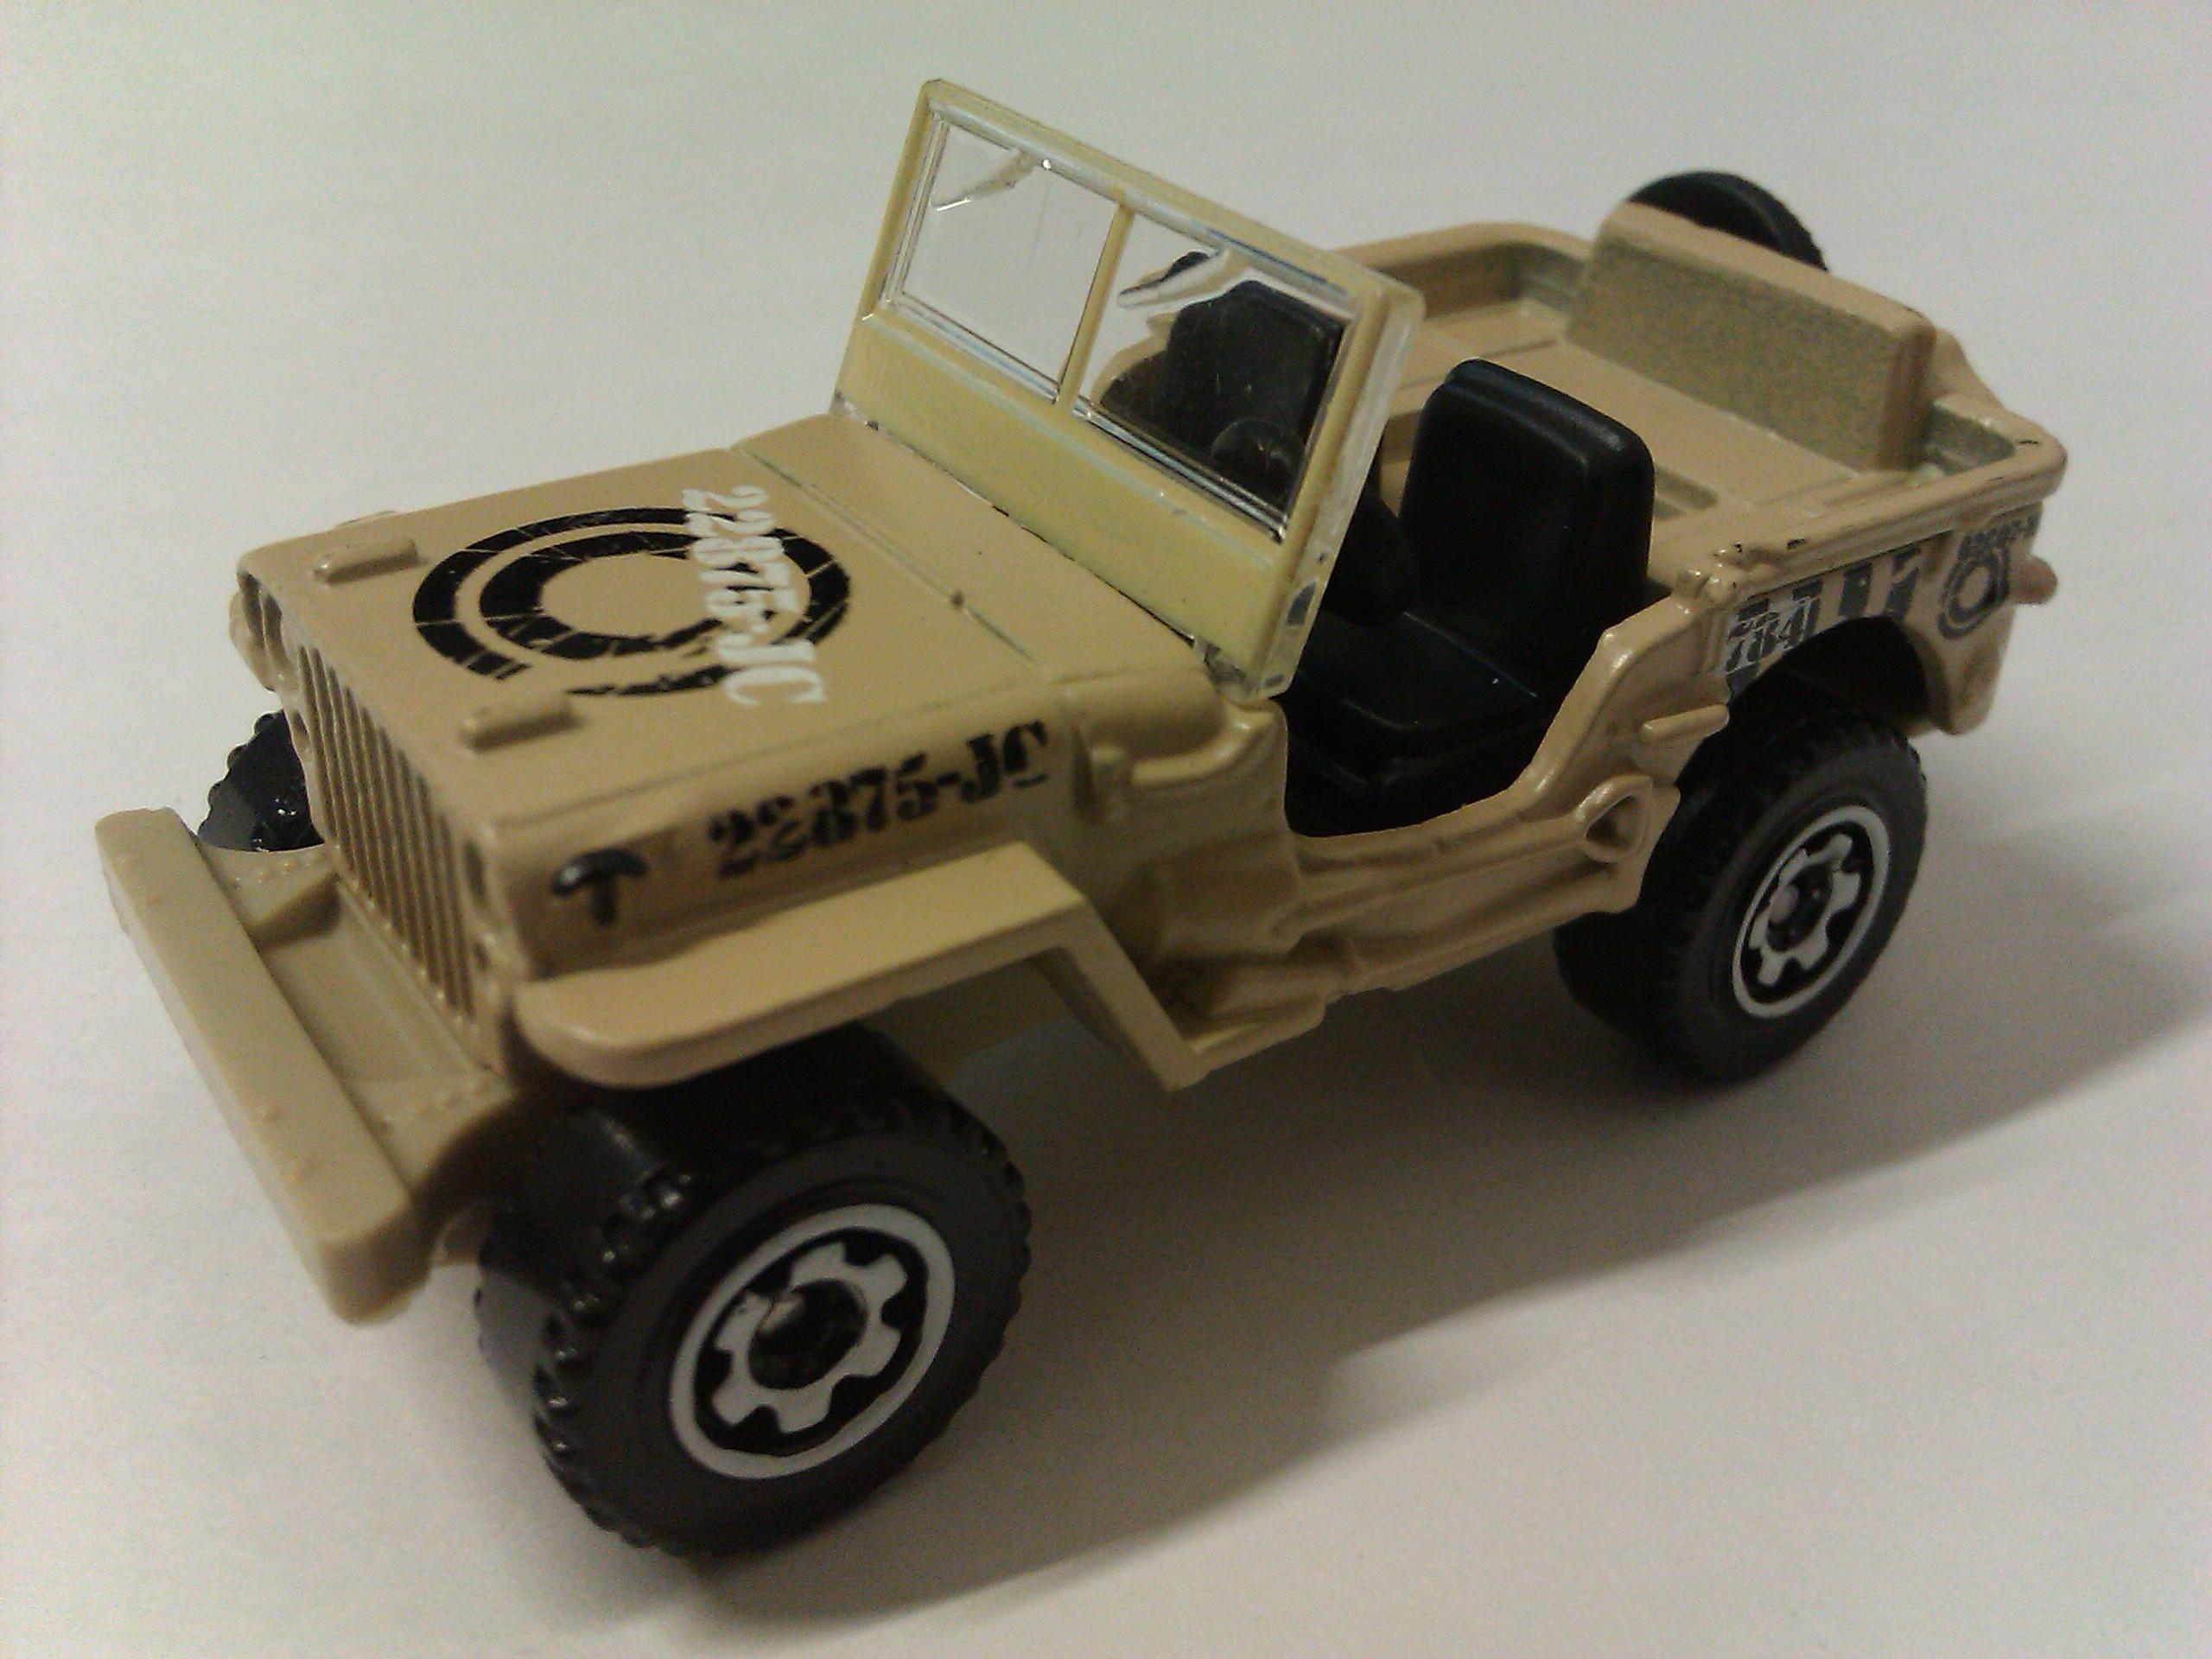 Jeep Willys Matchbox Cars Wiki